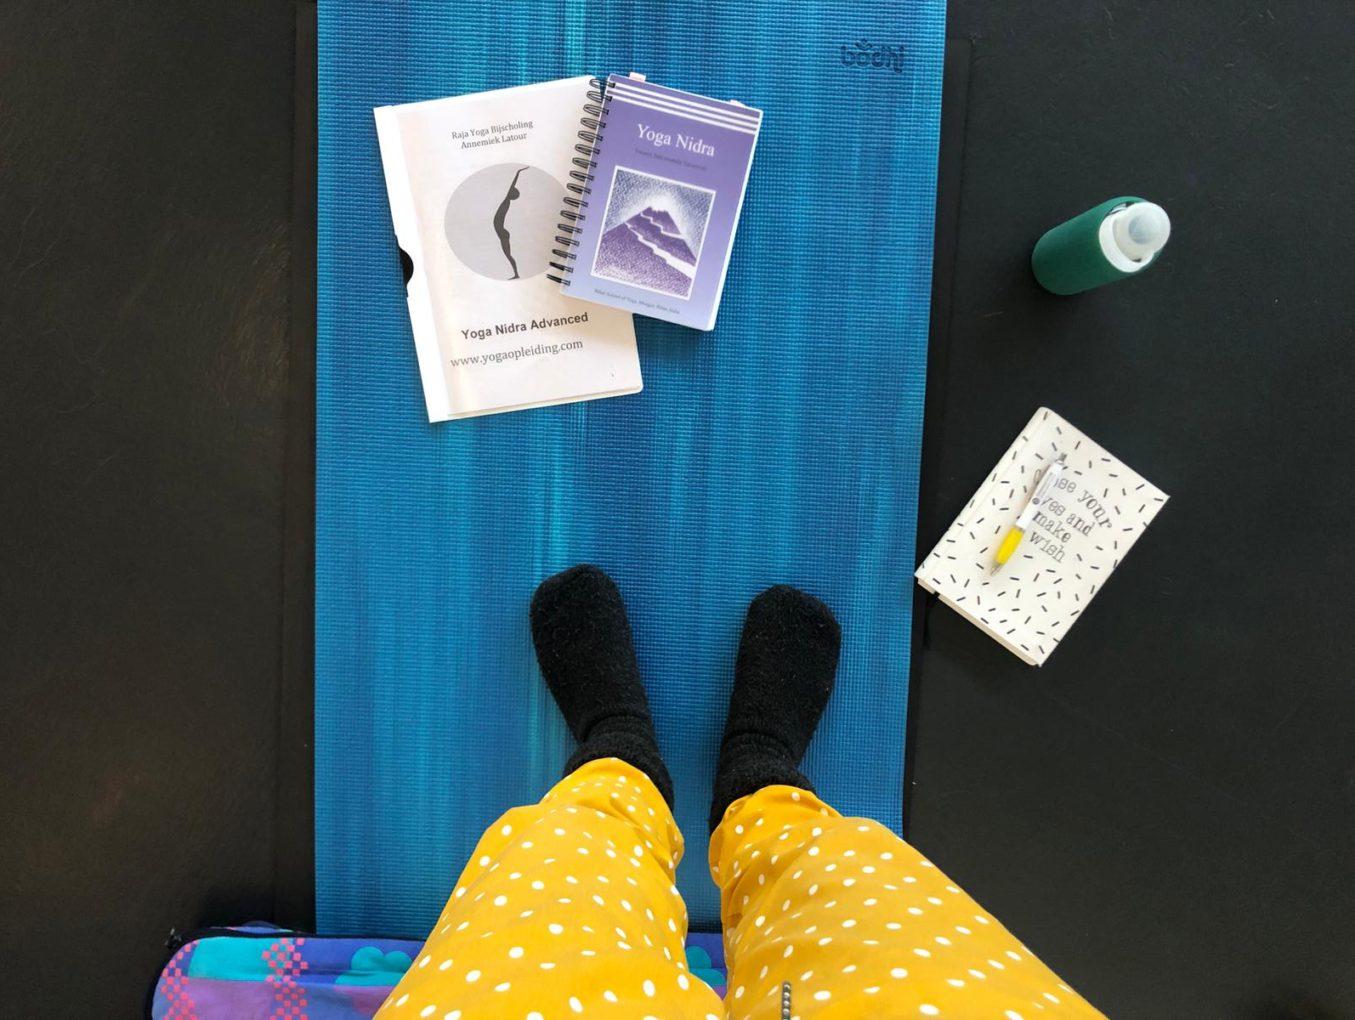 Yoga Nidra: Ontspannen Ondernemen